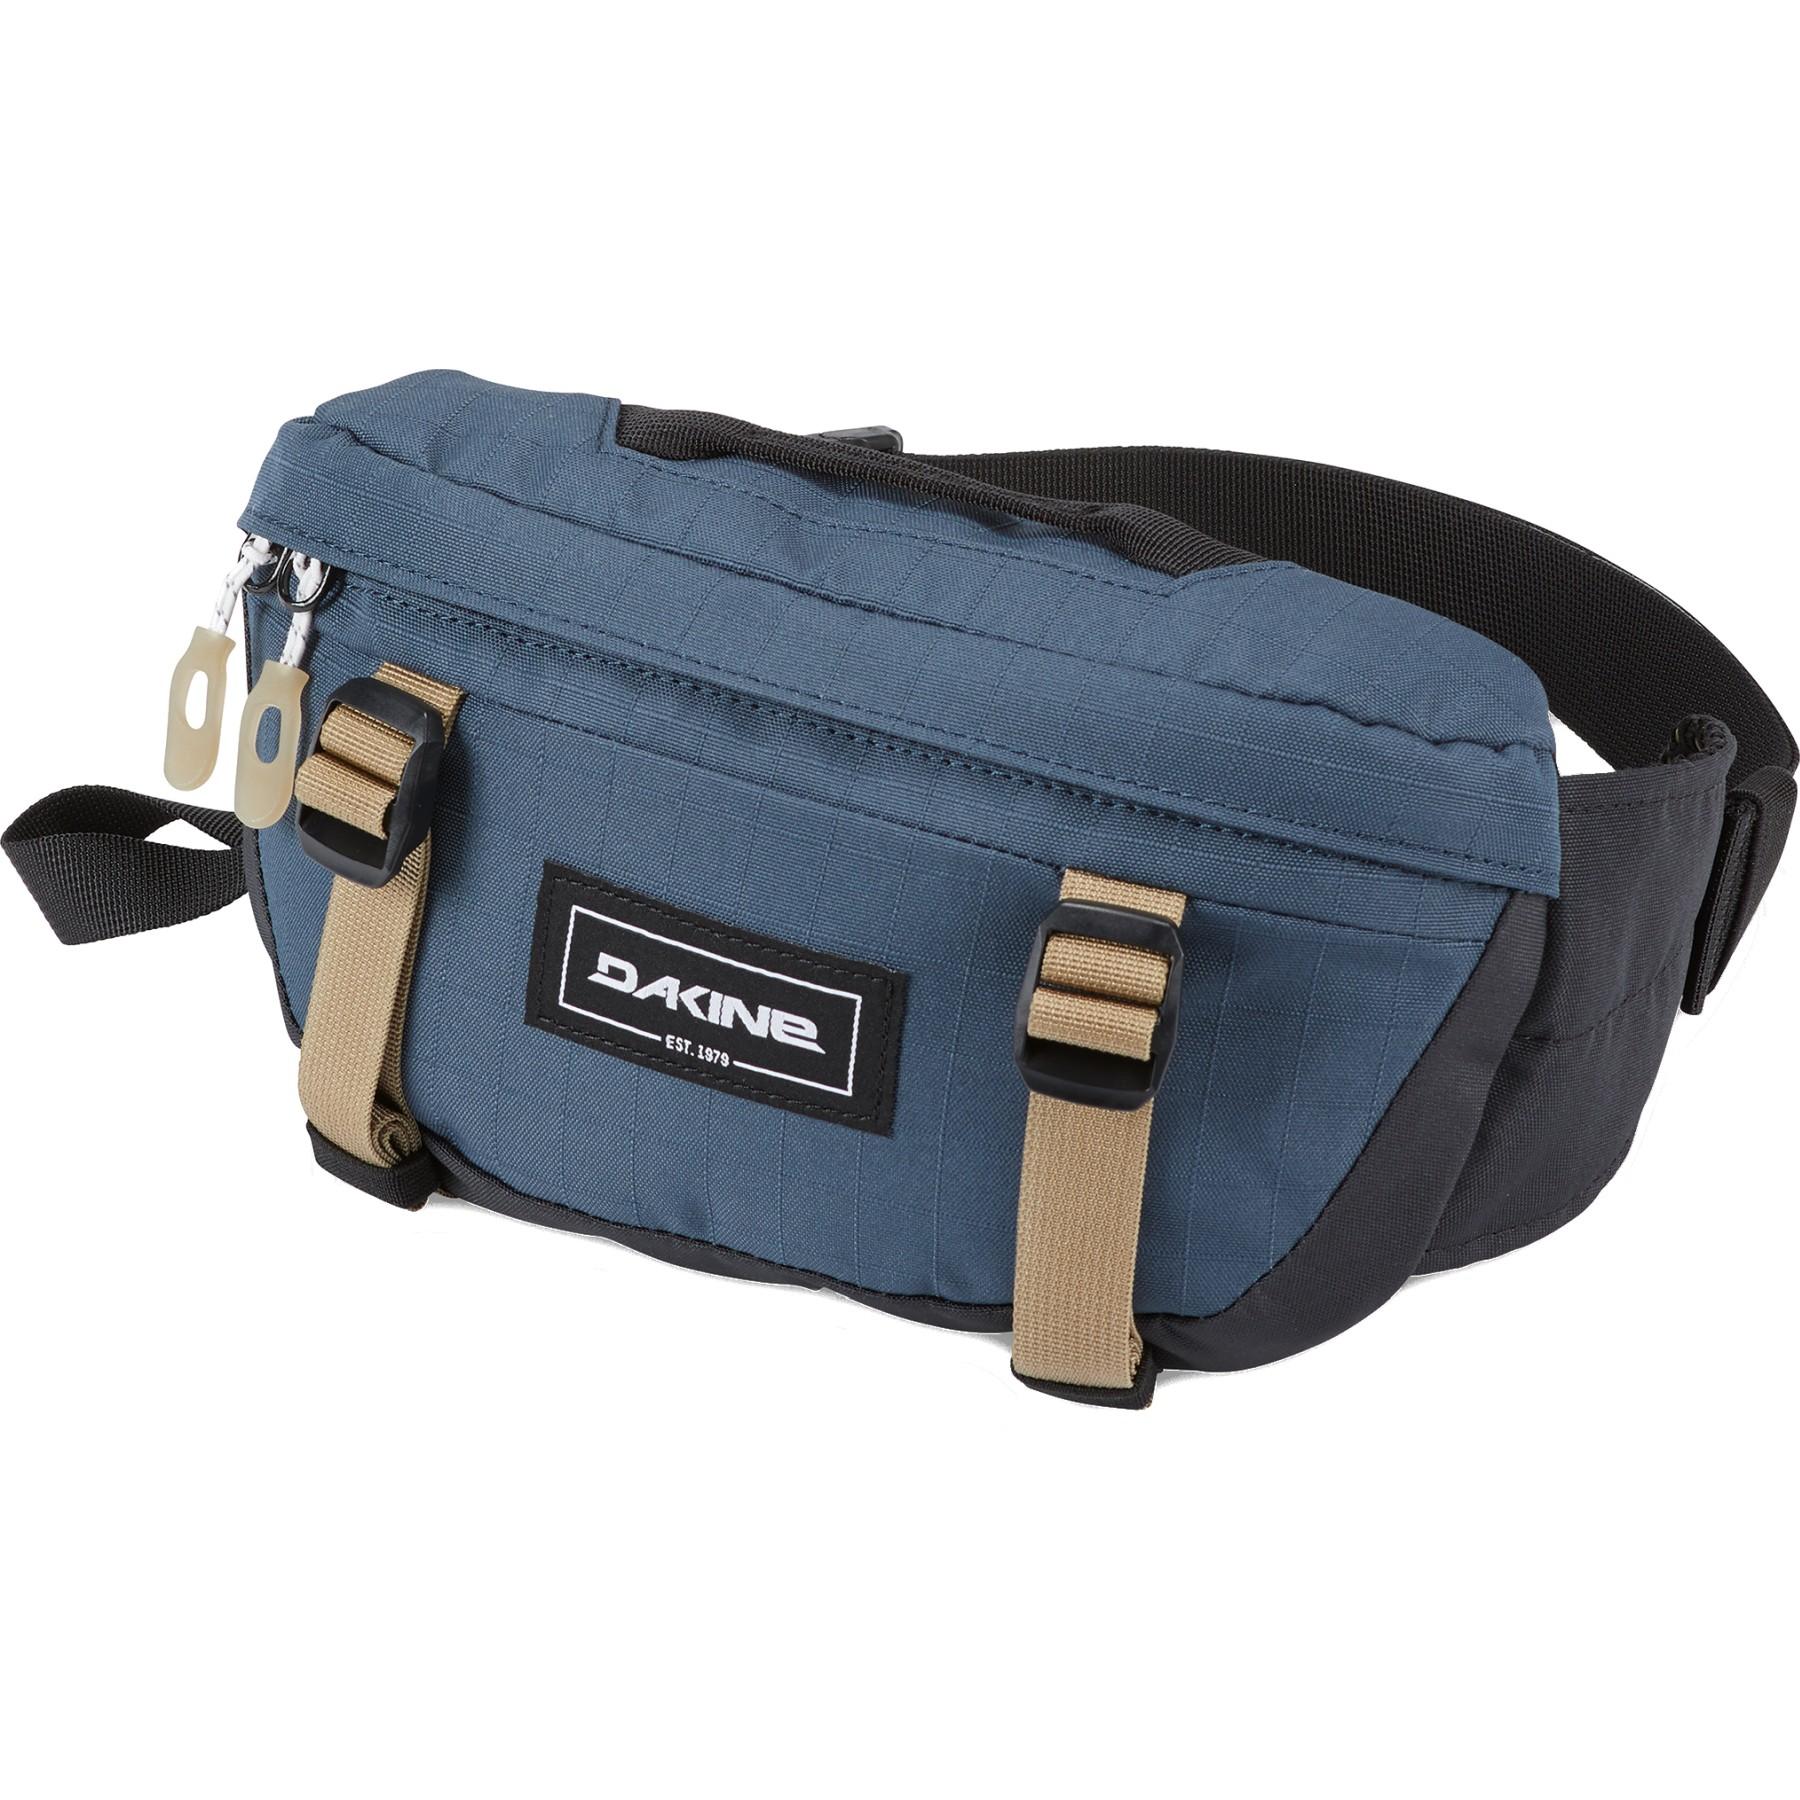 Dakine Hot Laps 1L Bike Waist Bag - midnight blue